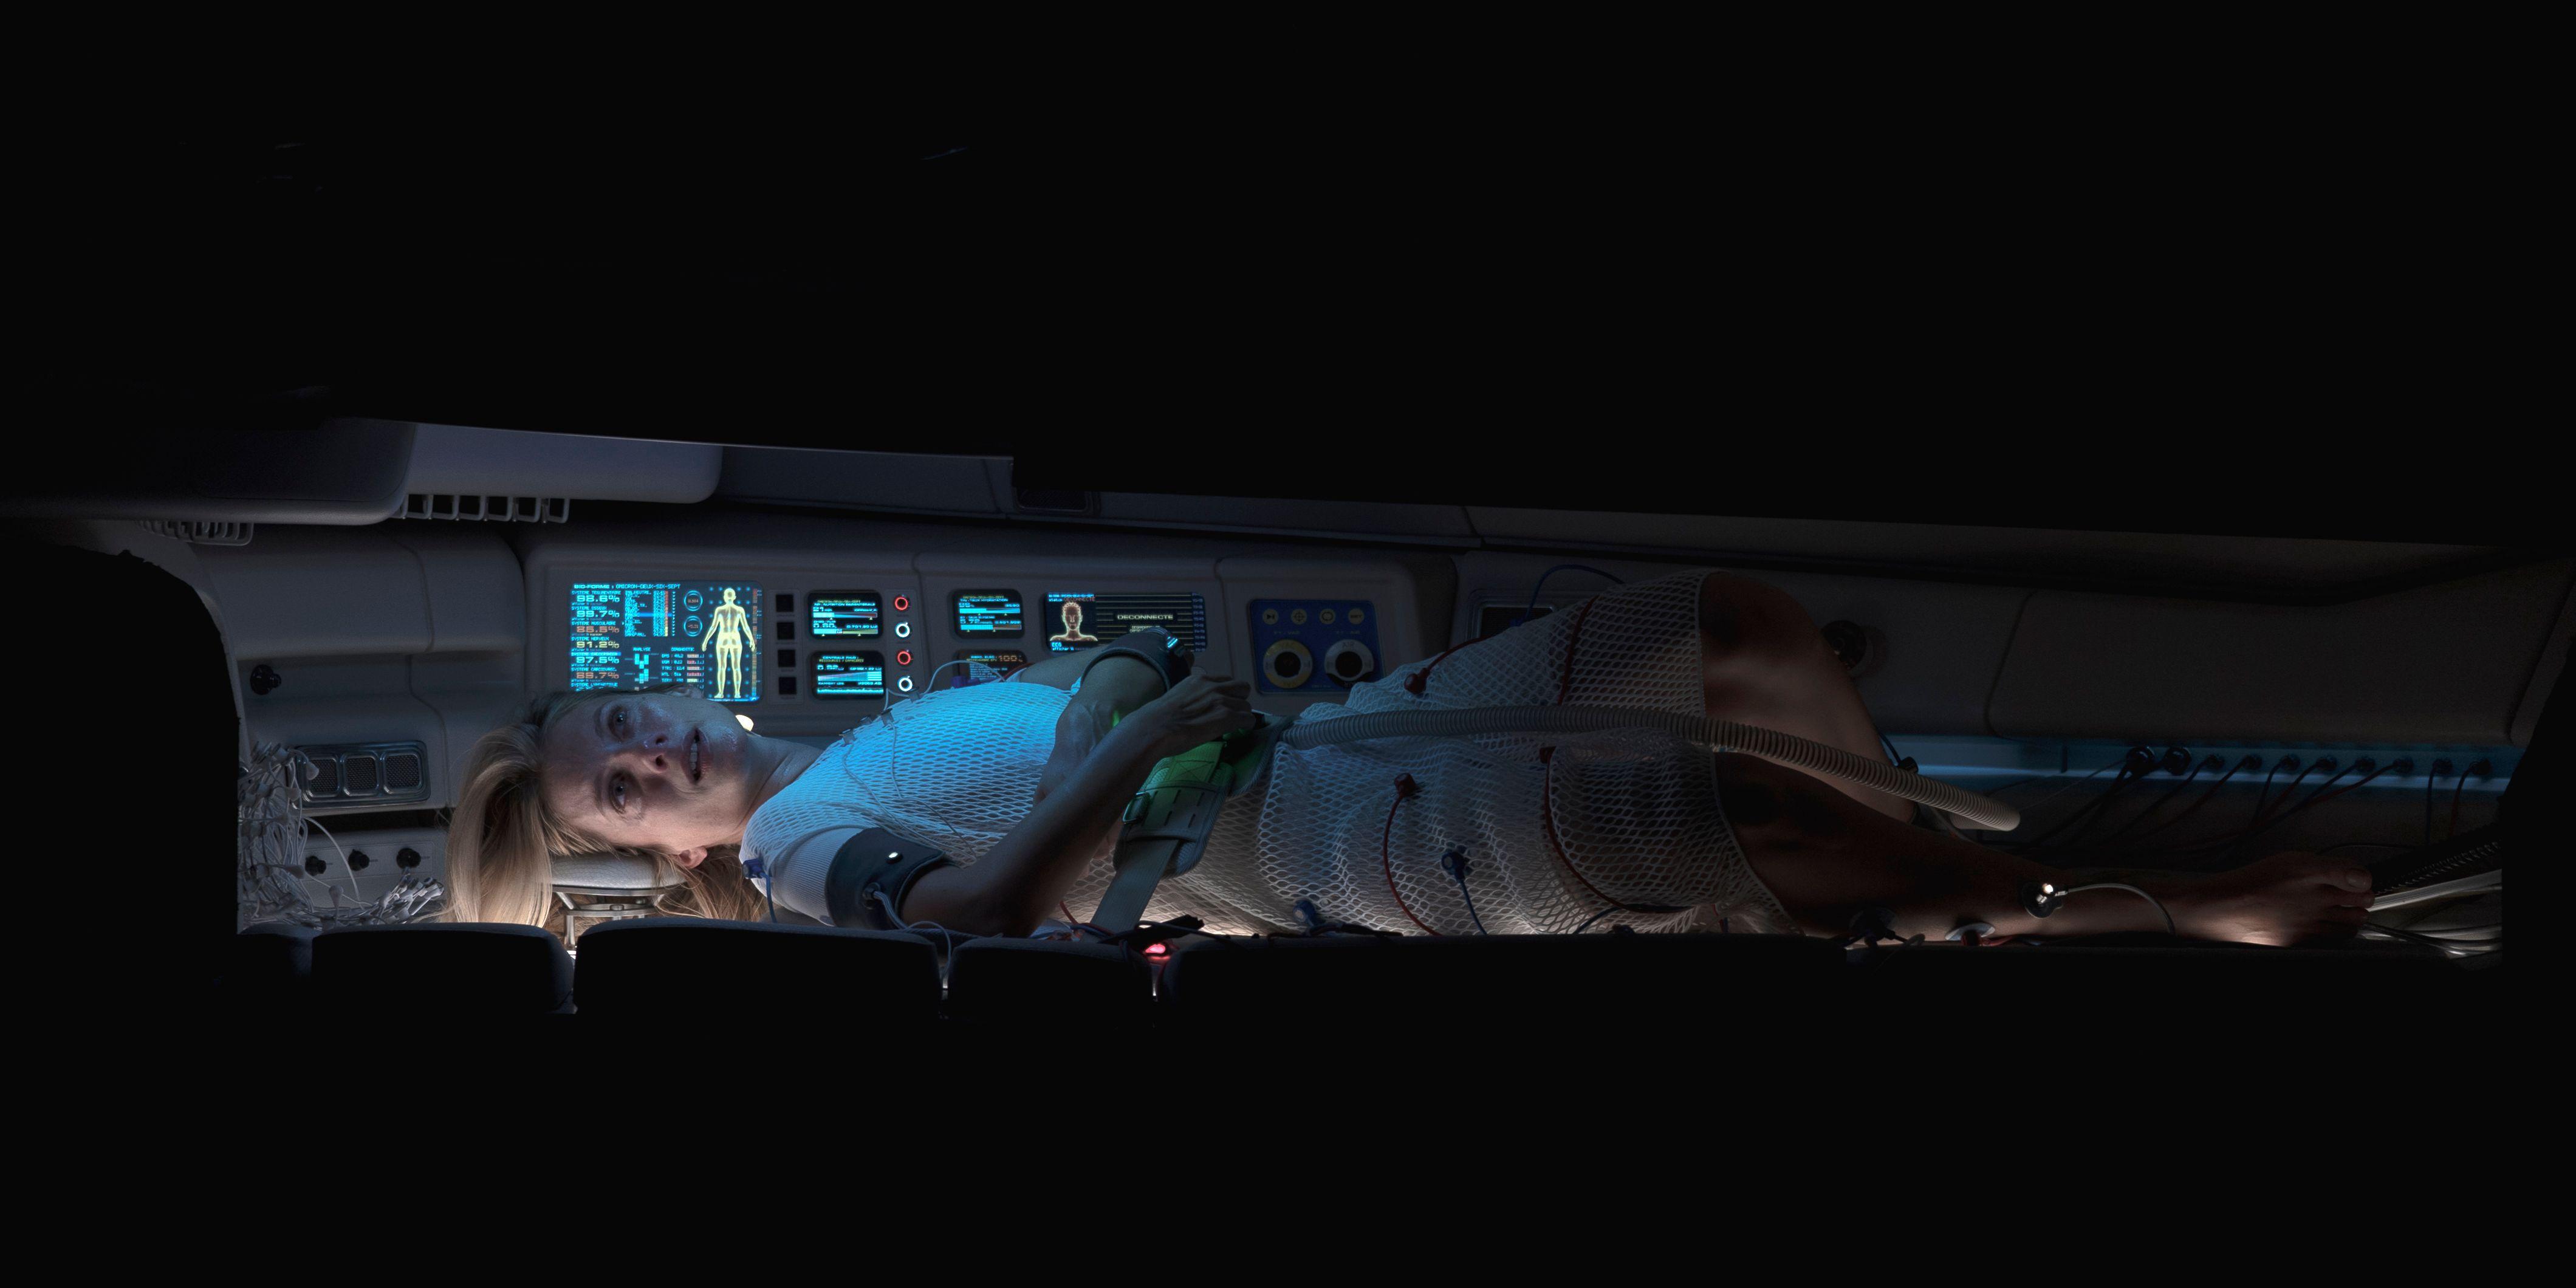 Mélanie Laurent Needs Oxygen in New Netflix Horror Movie Images